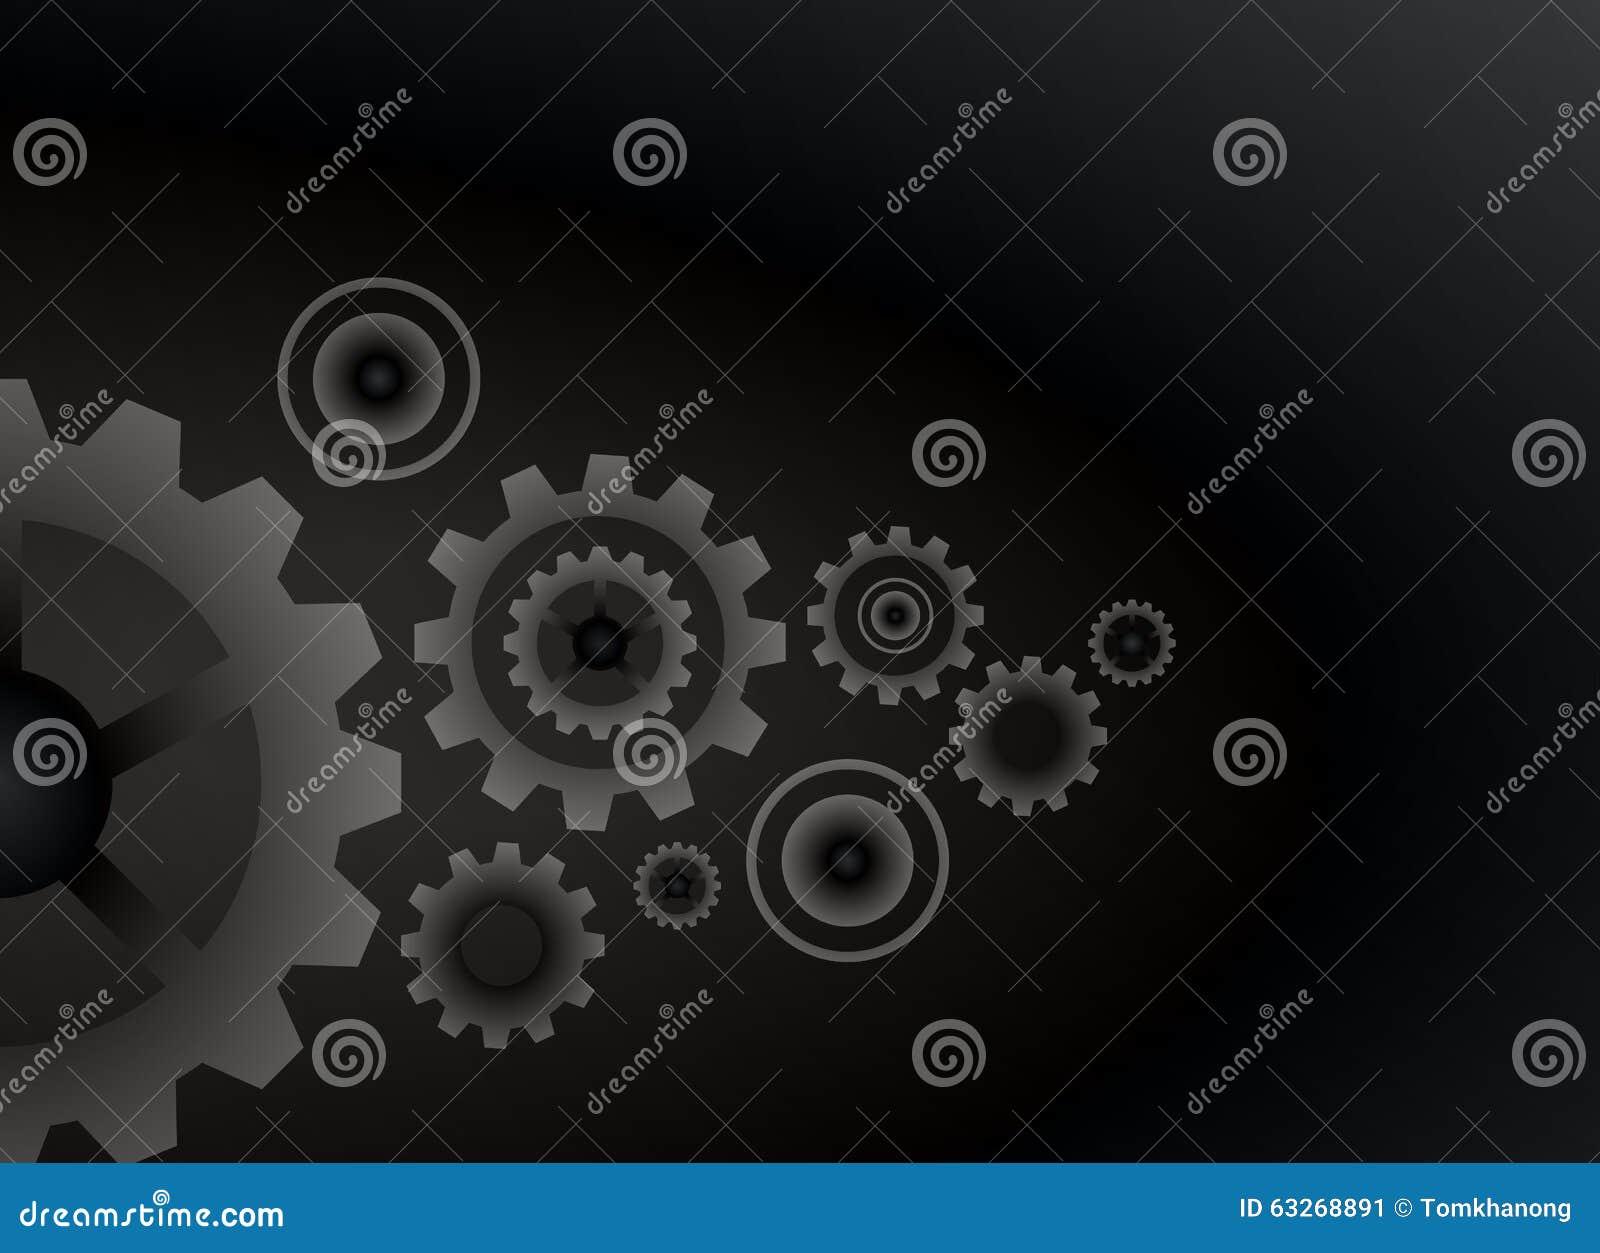 cogs wheels black color background vector design stock vector